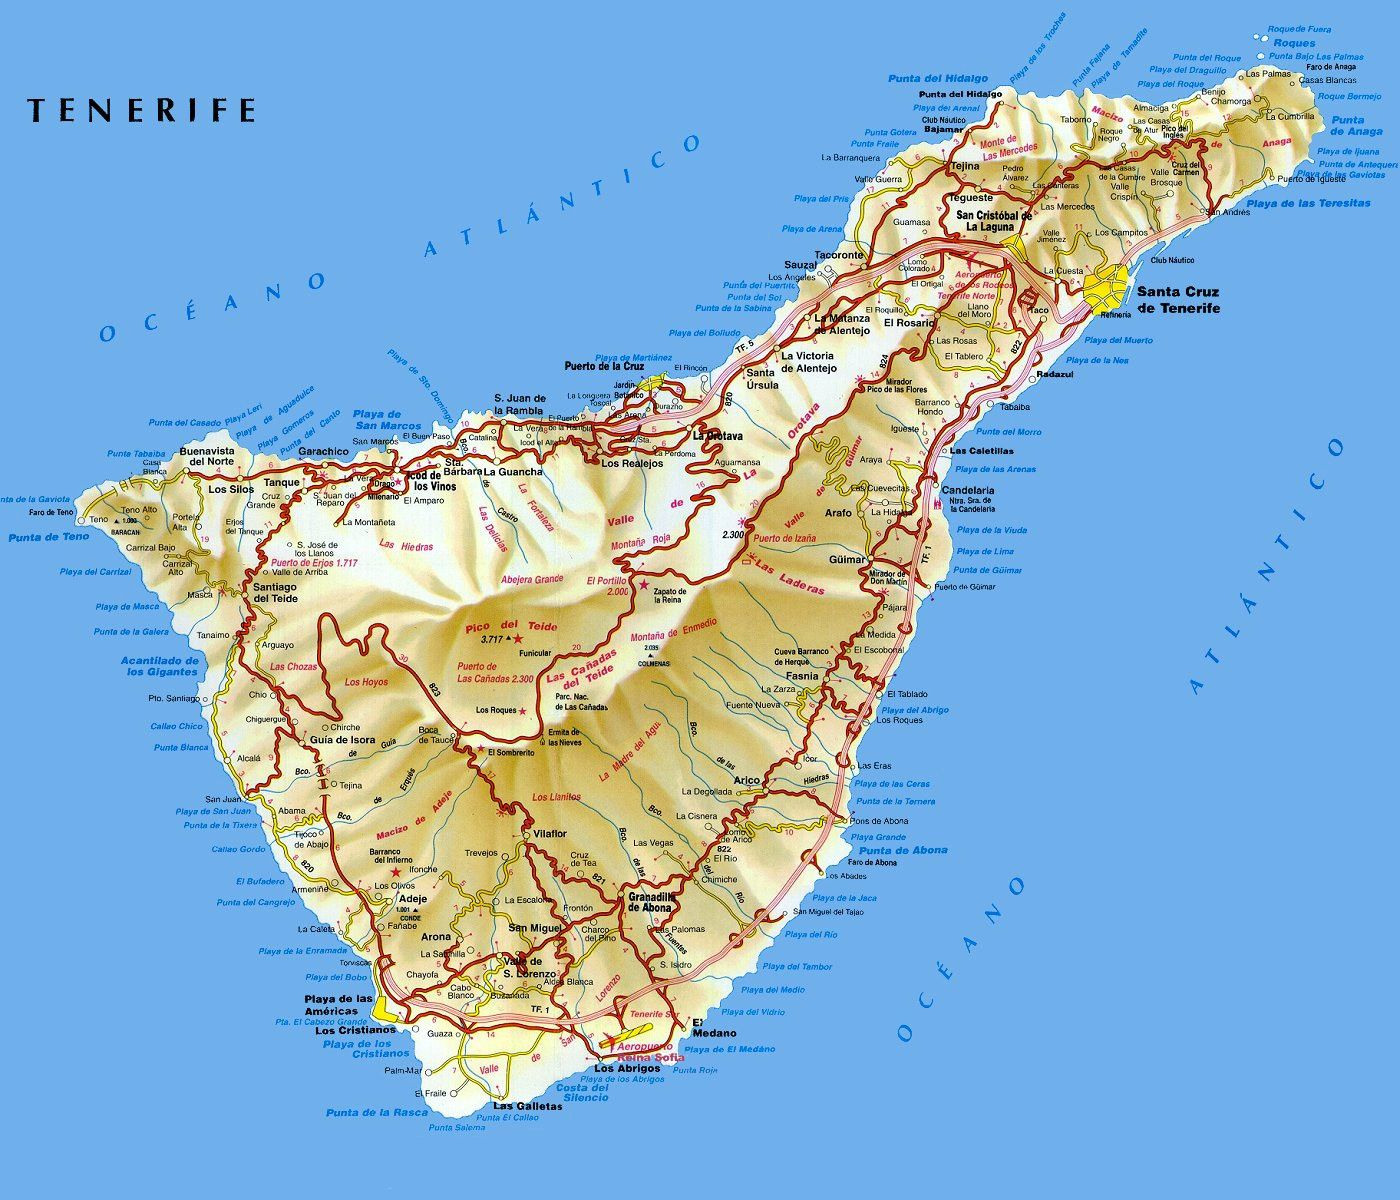 kart over tenerife Kart+over+Tenerife. 1 400 × 1 200 bildepunkter | Islas Canarias  kart over tenerife